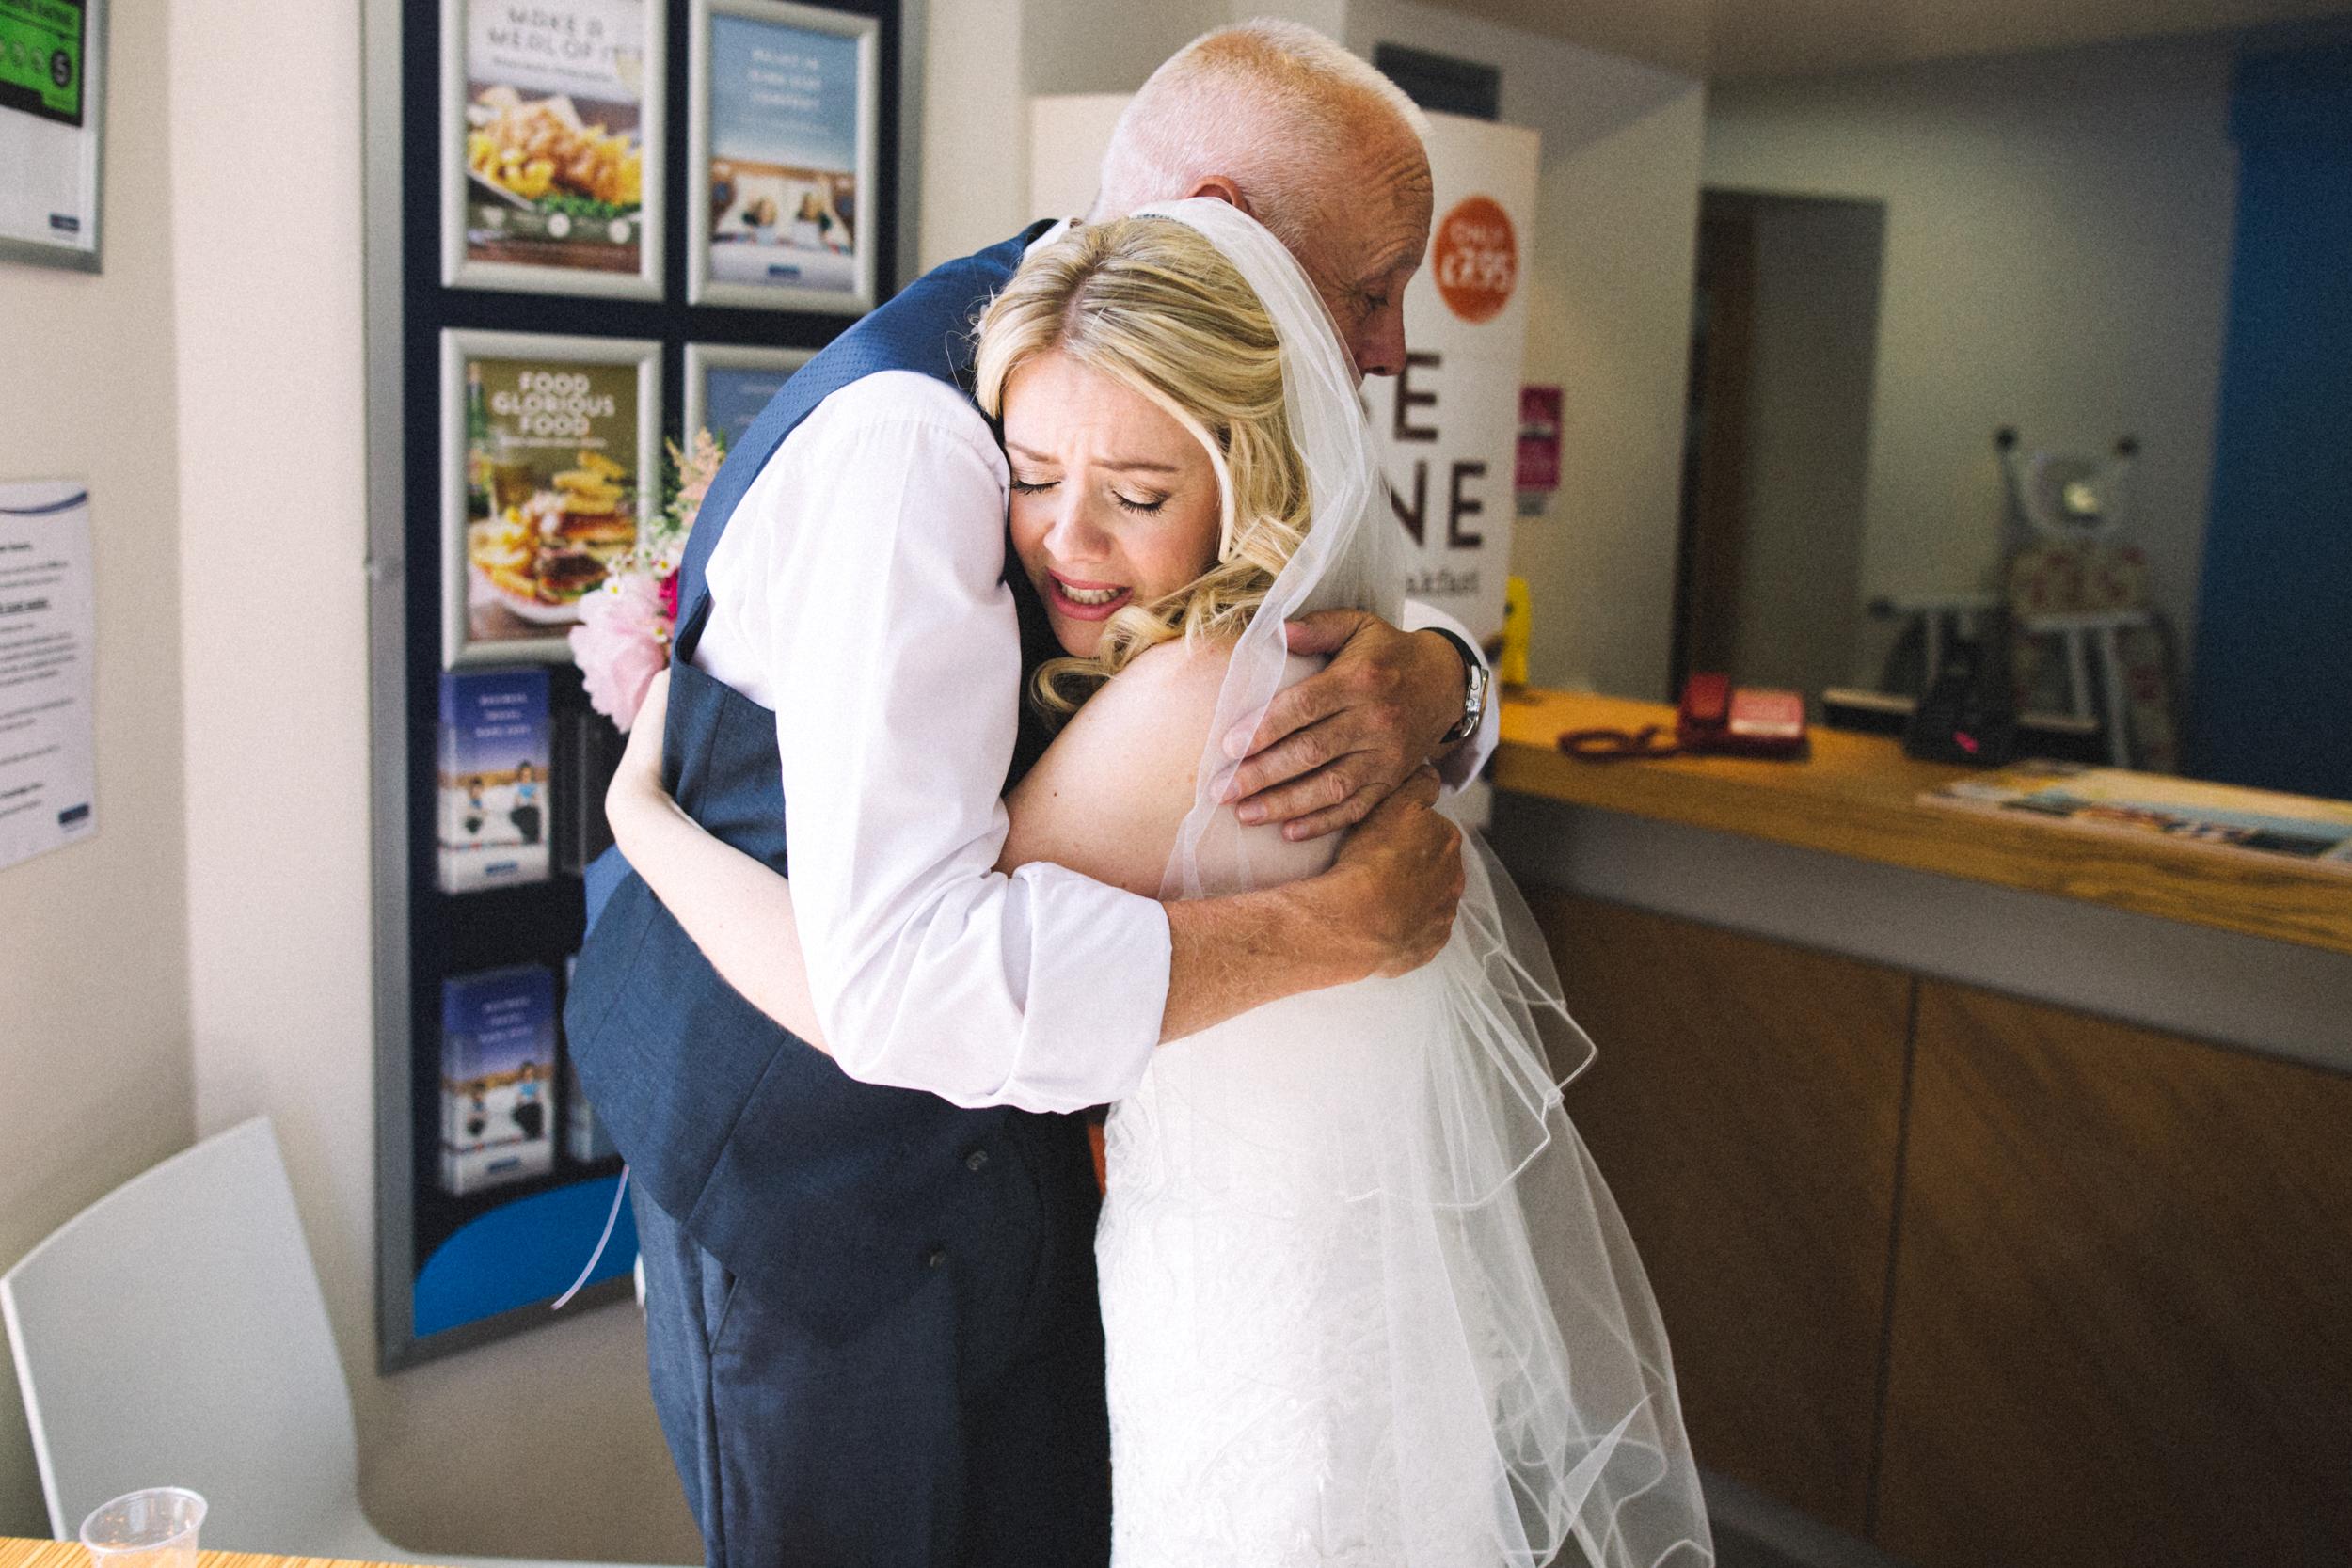 creative-wedding-photography-teesside-north-east-yorkshire-45.jpg